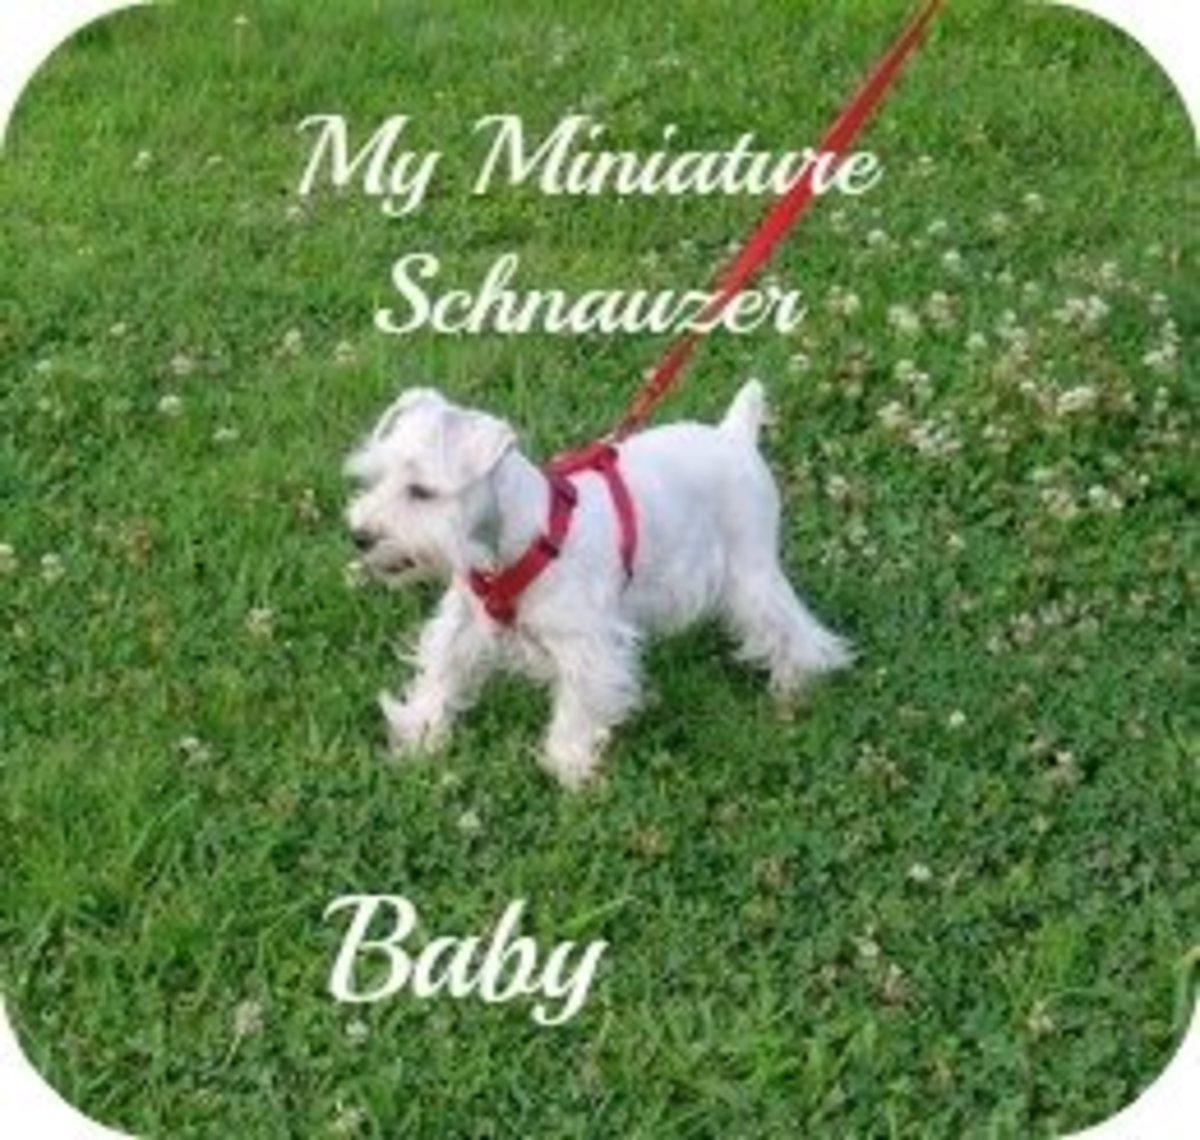 My Miniature Schnauzer Has Canine Intervertebral Disc Disease